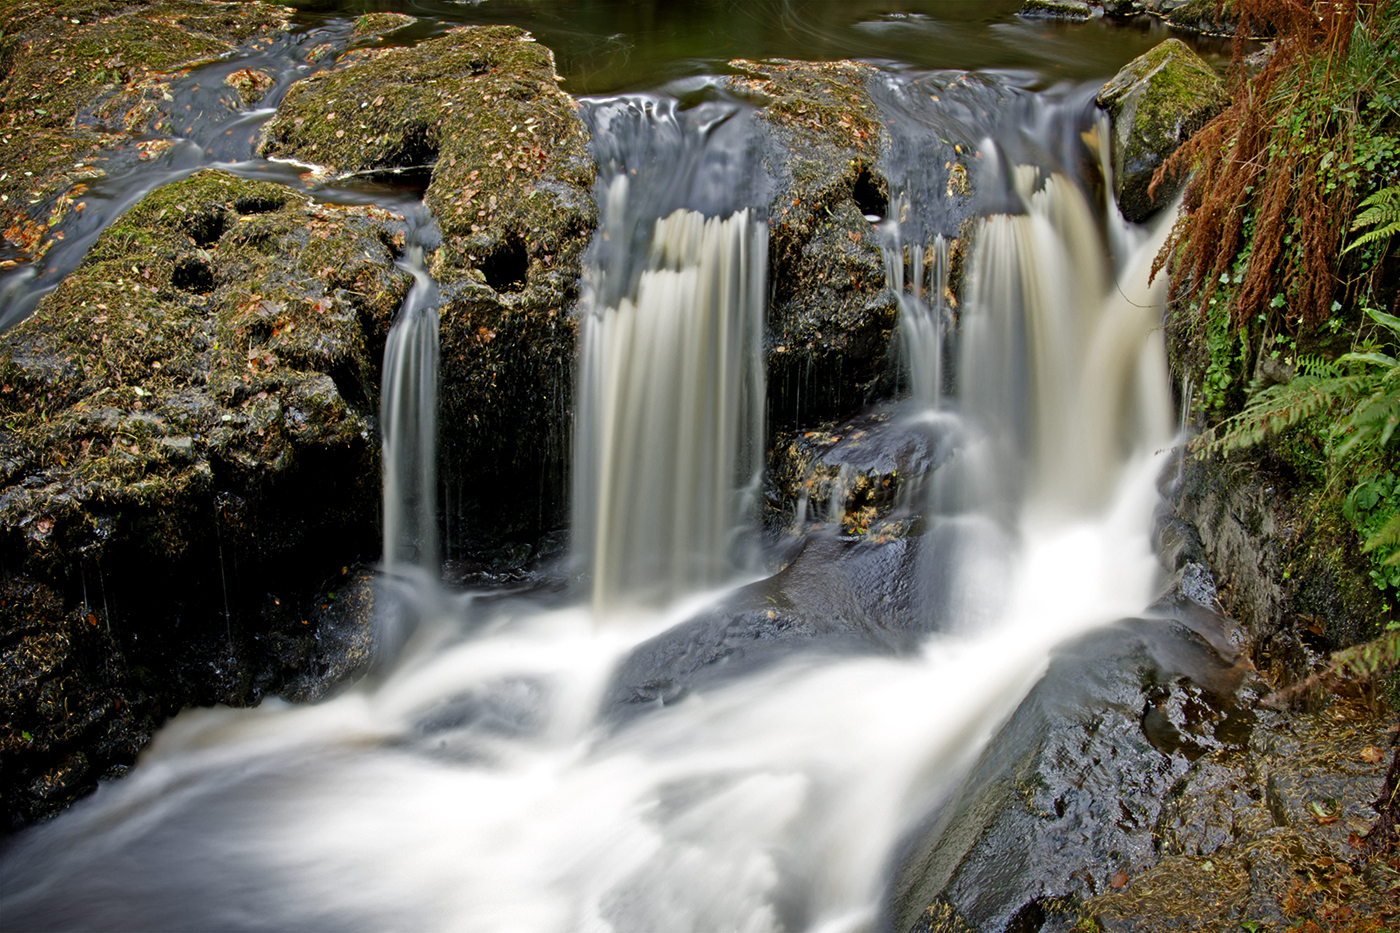 Waterfall_Audra Dodas_F.jpg